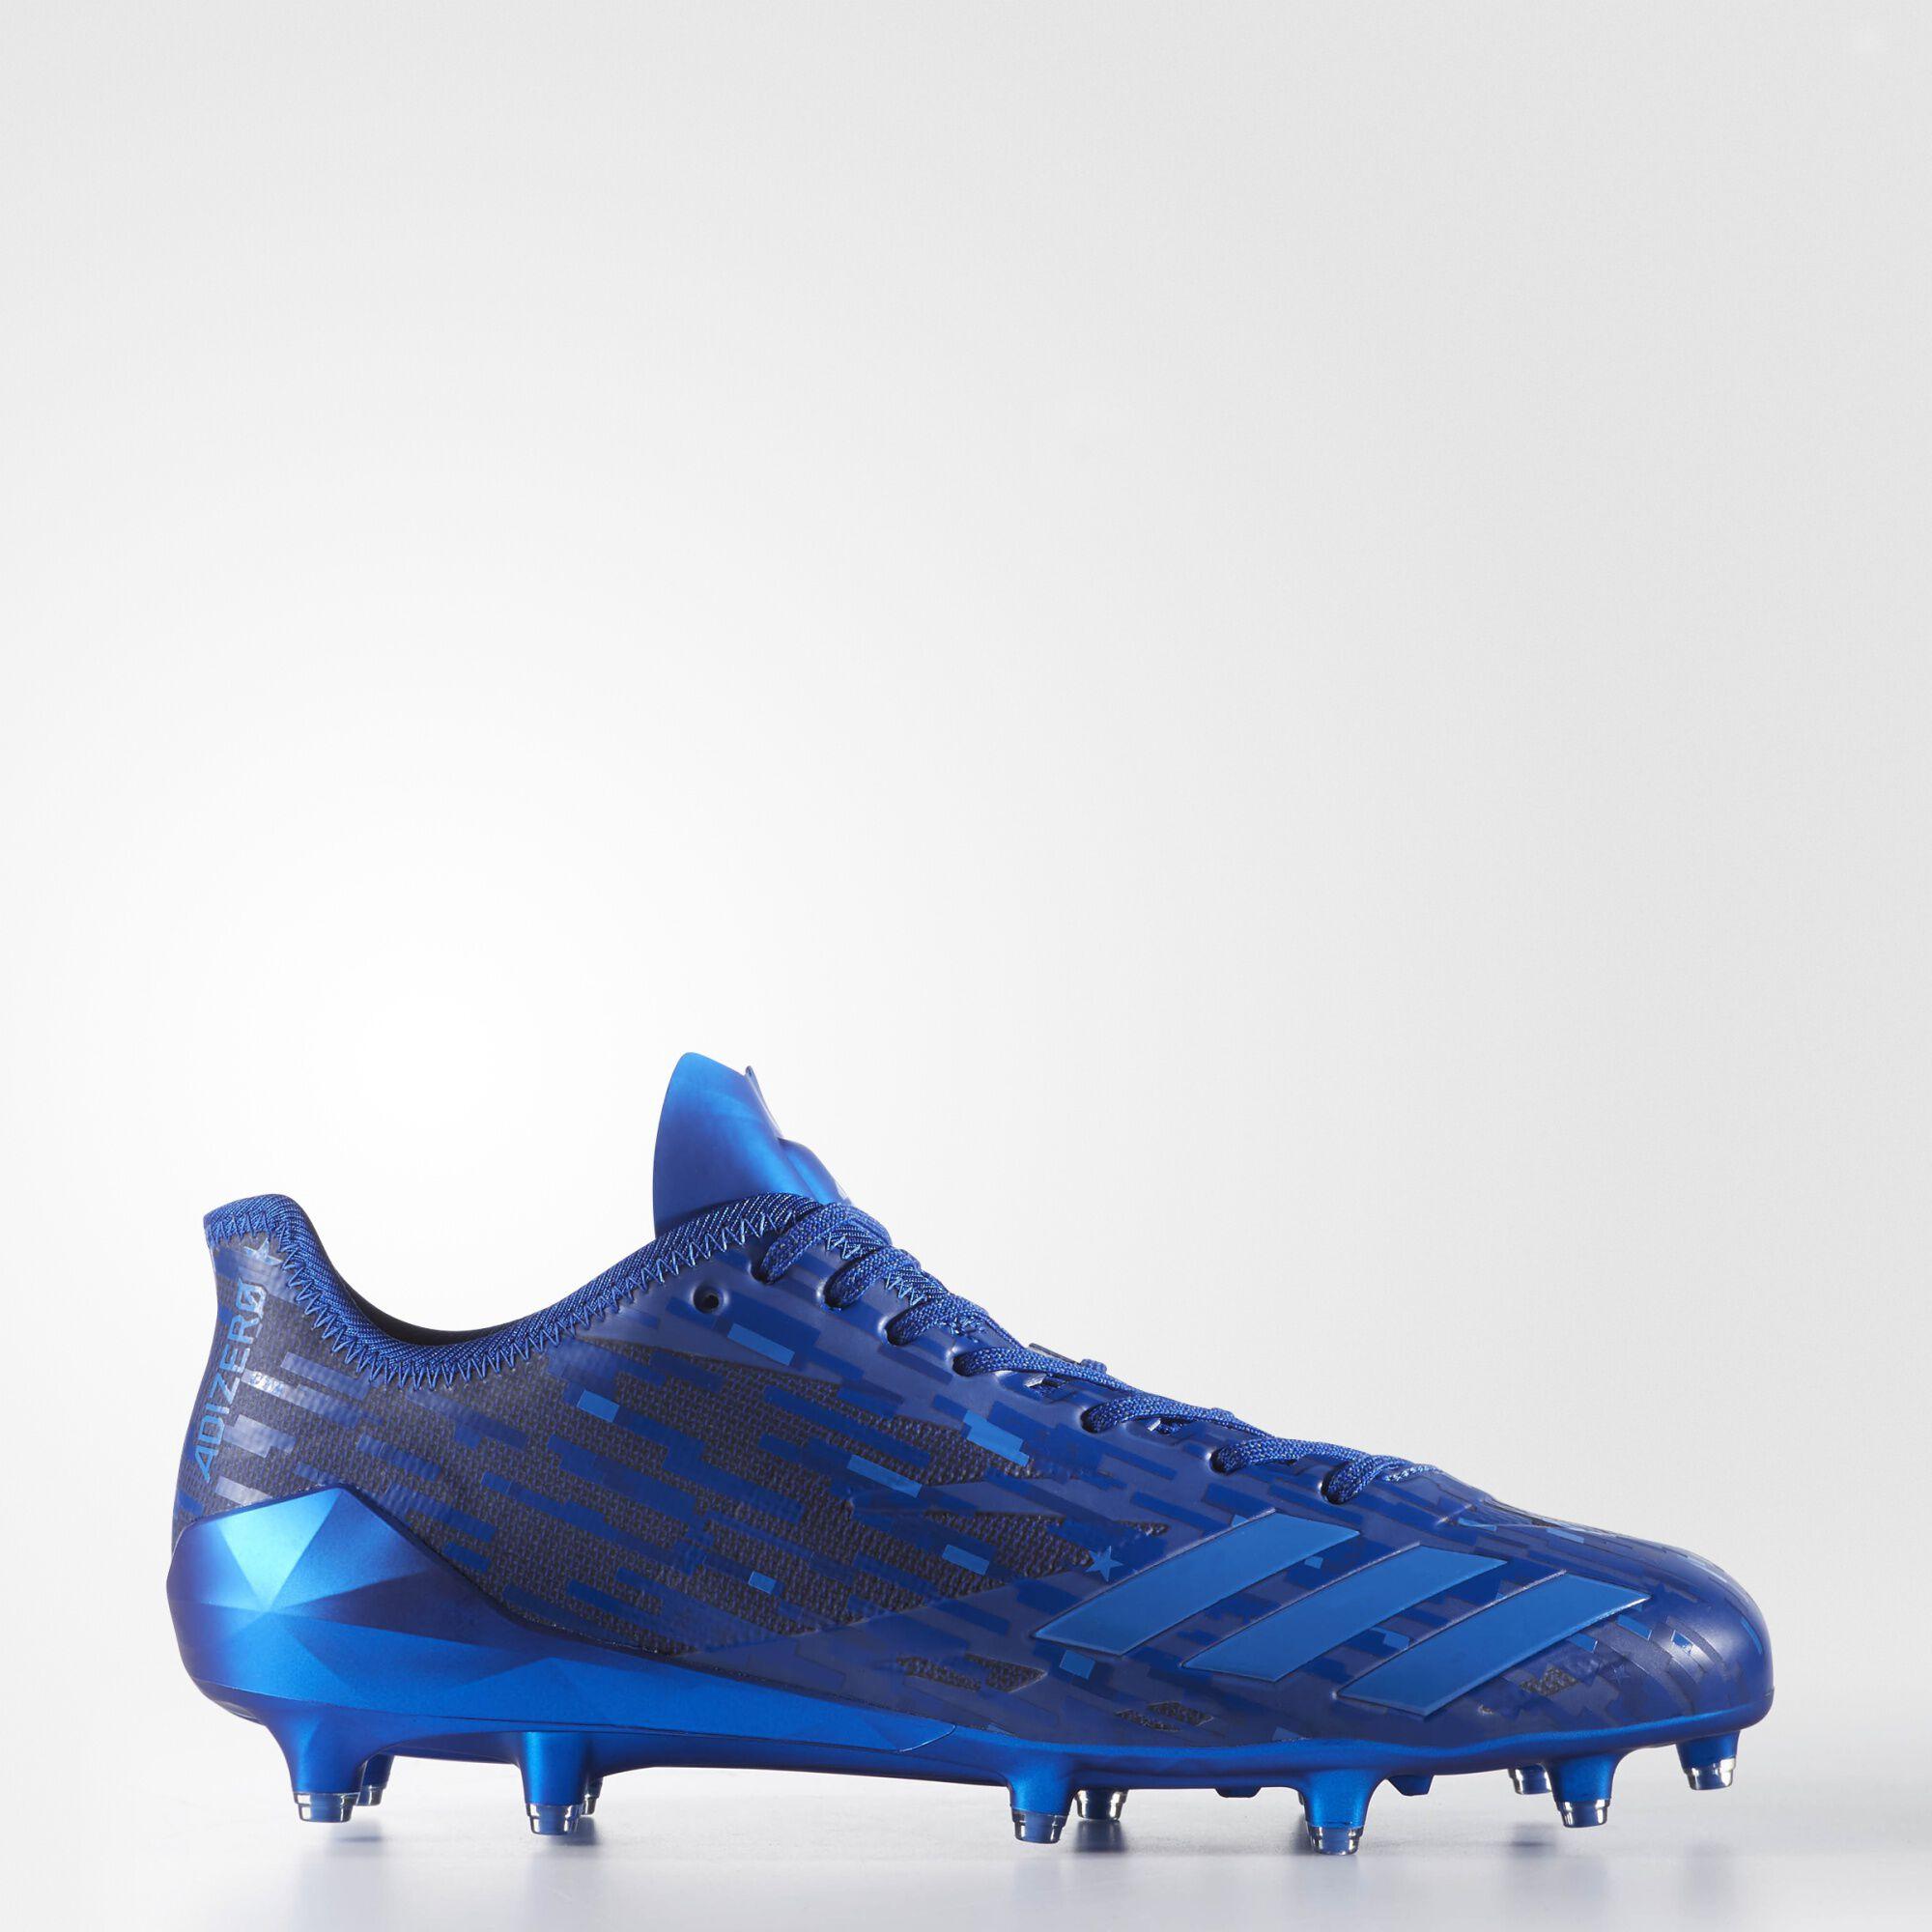 buy online f08ad 3506e adidas superstar shoes  adidas adizero 5 star 6.0 army dipped cleats powder  blue satellite true